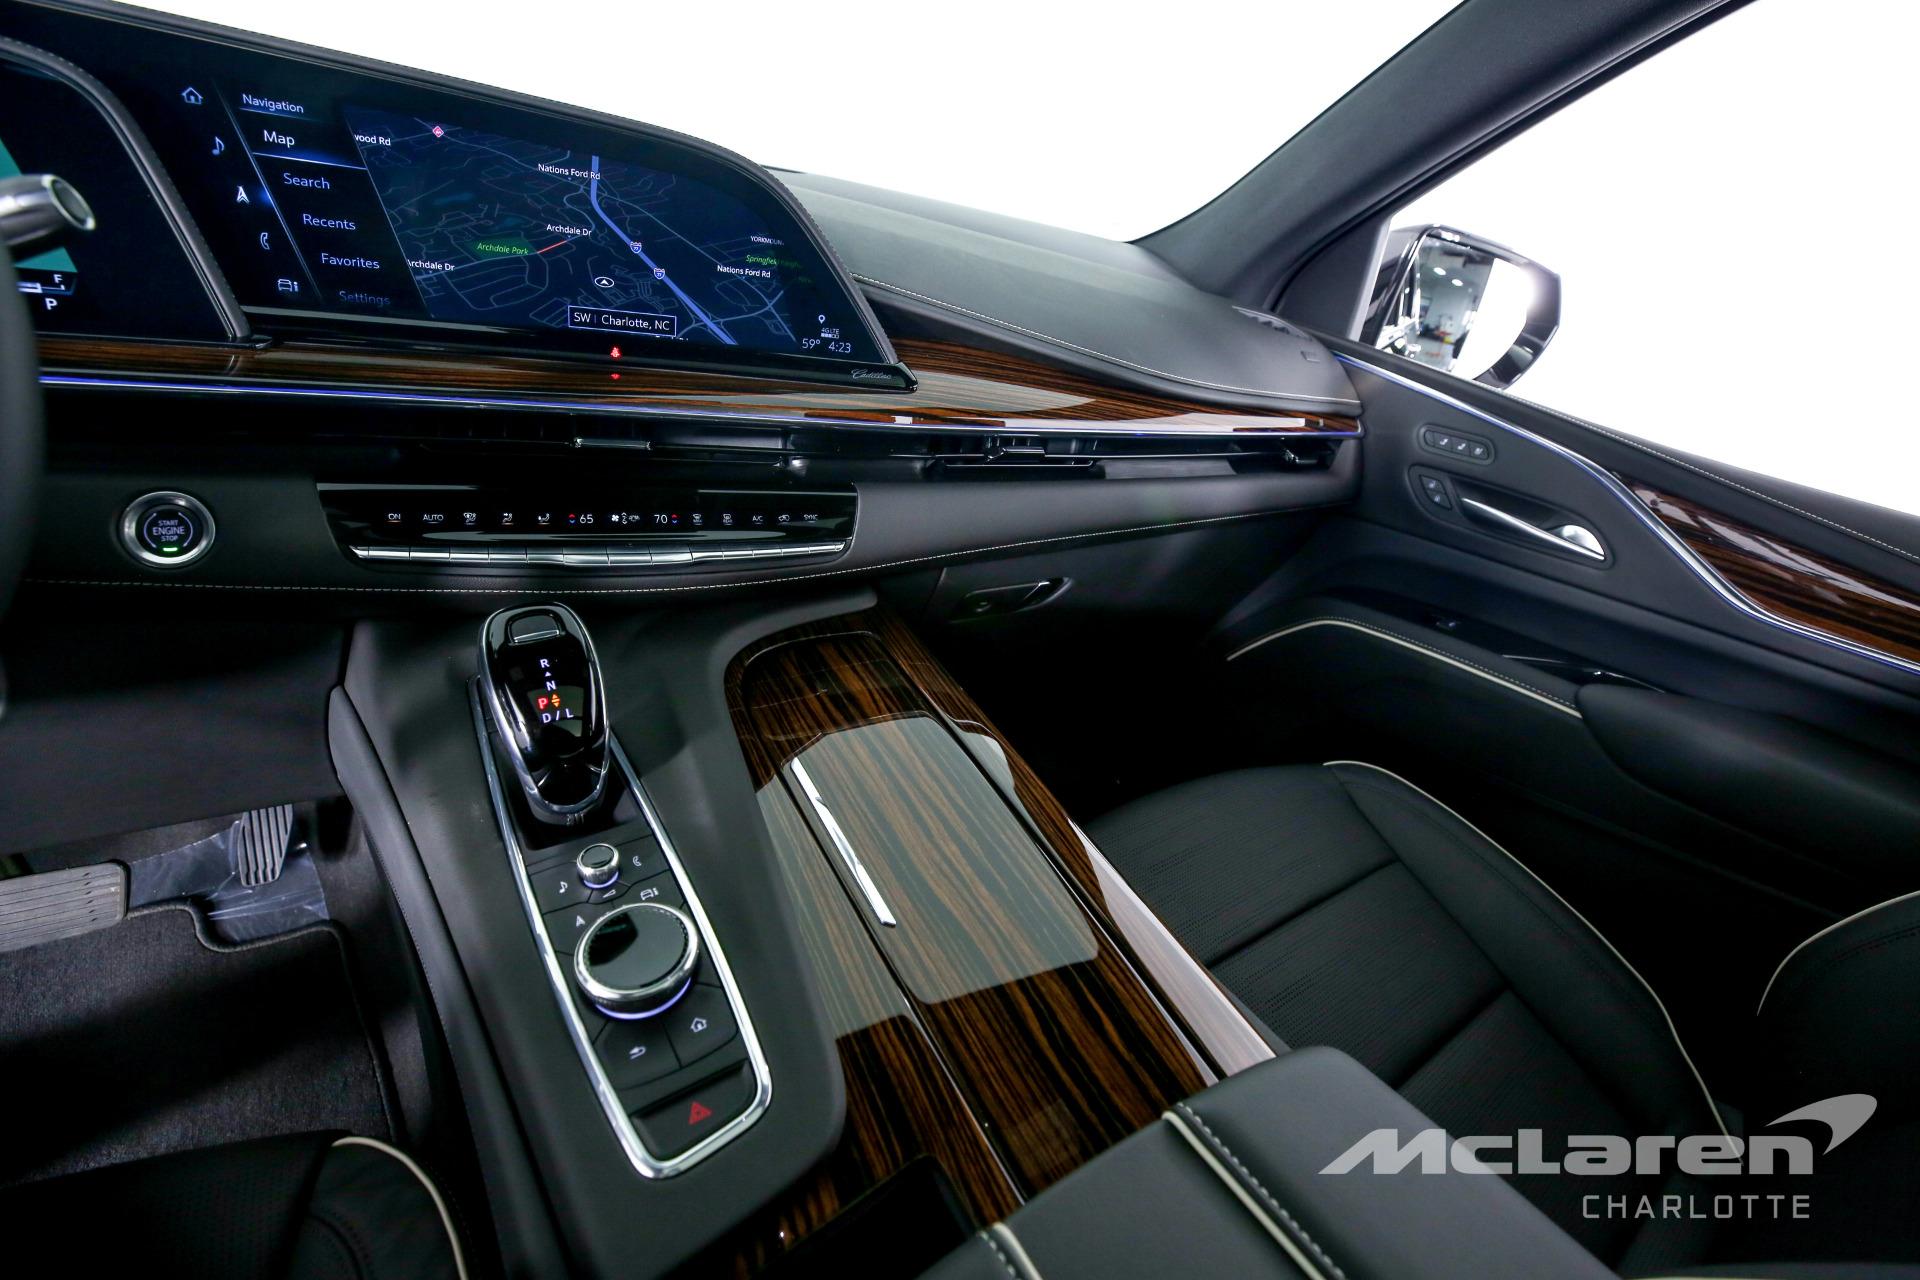 Used 2021 Cadillac Escalade ESV Premium Luxury | Charlotte, NC